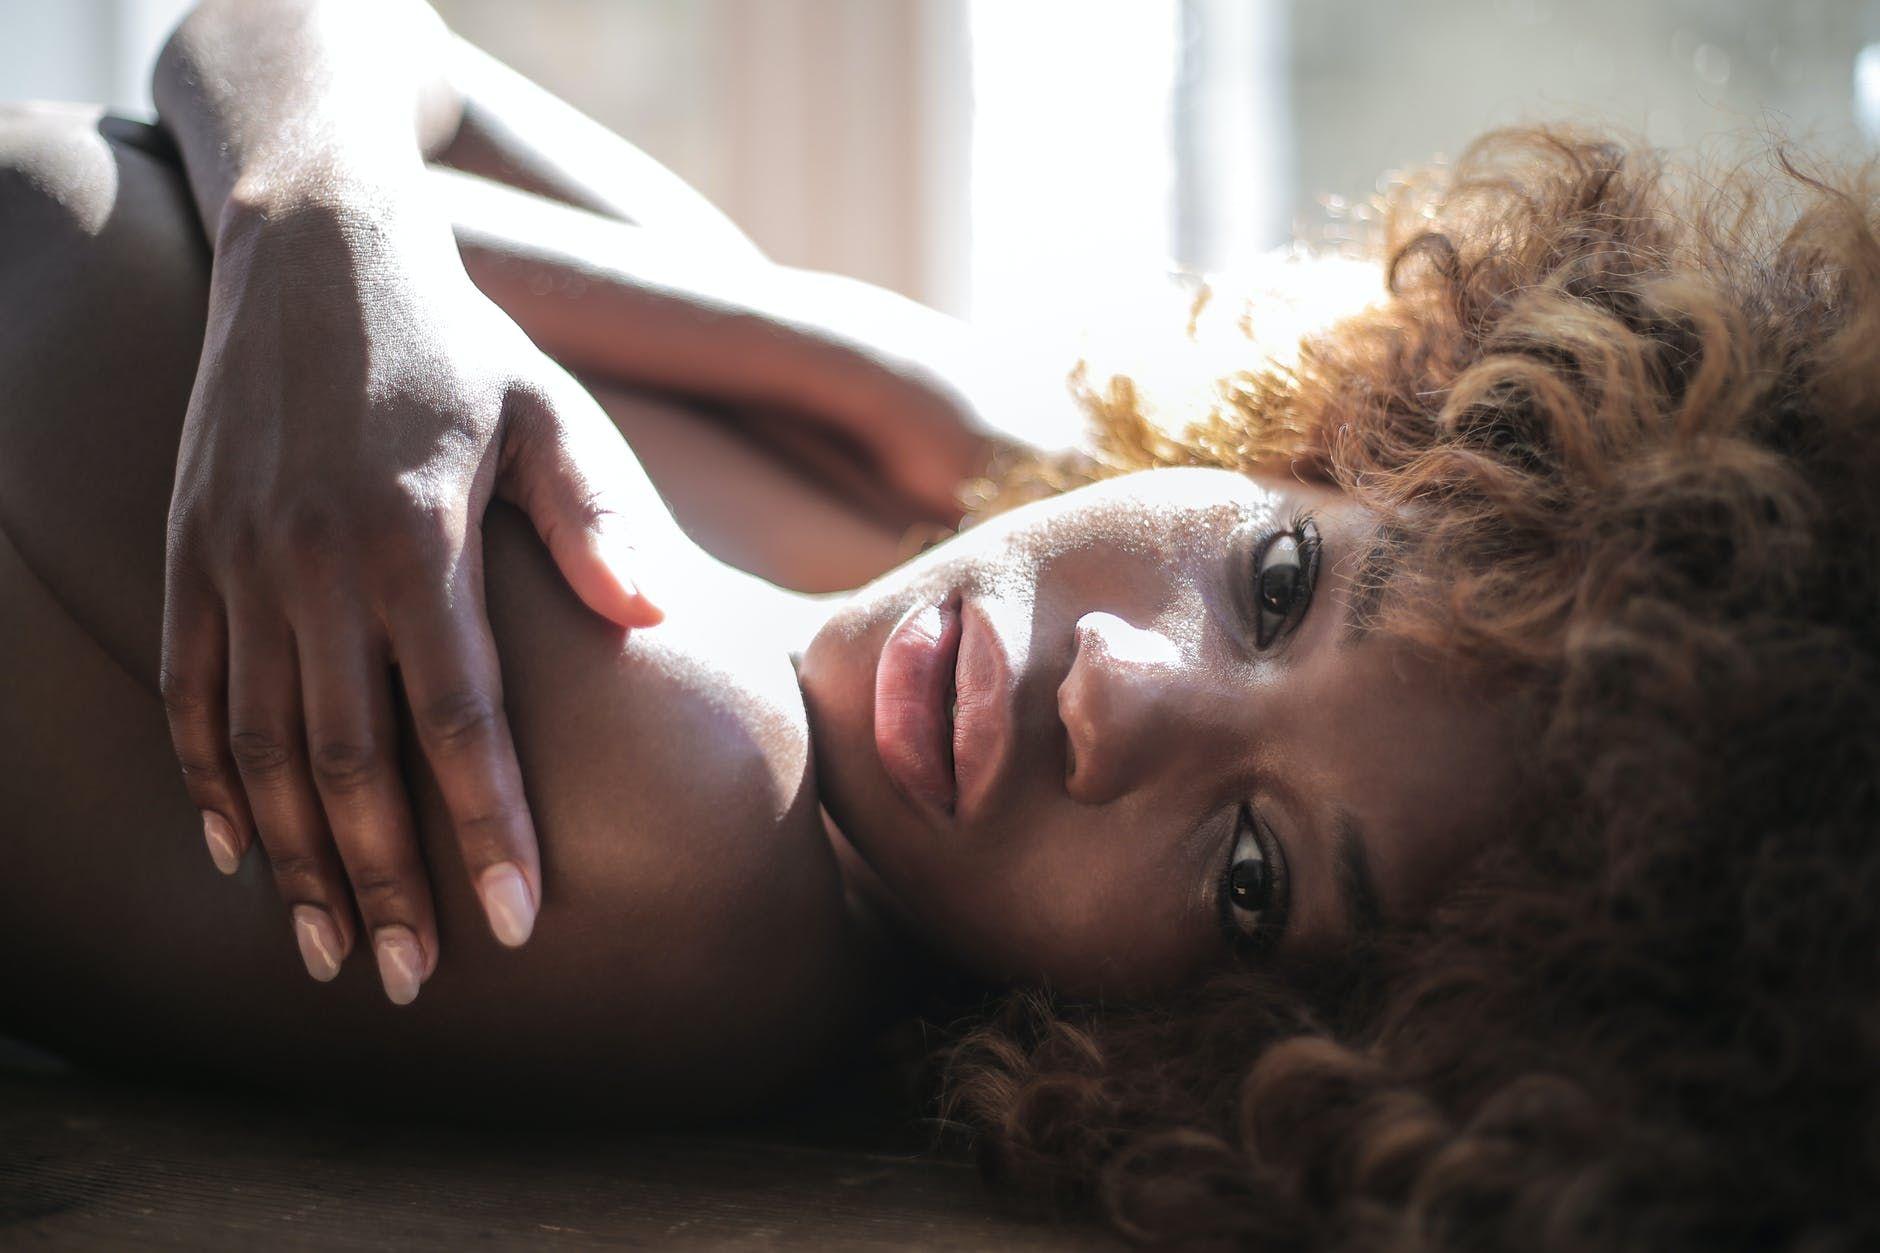 topless woman lying on floor in daylight